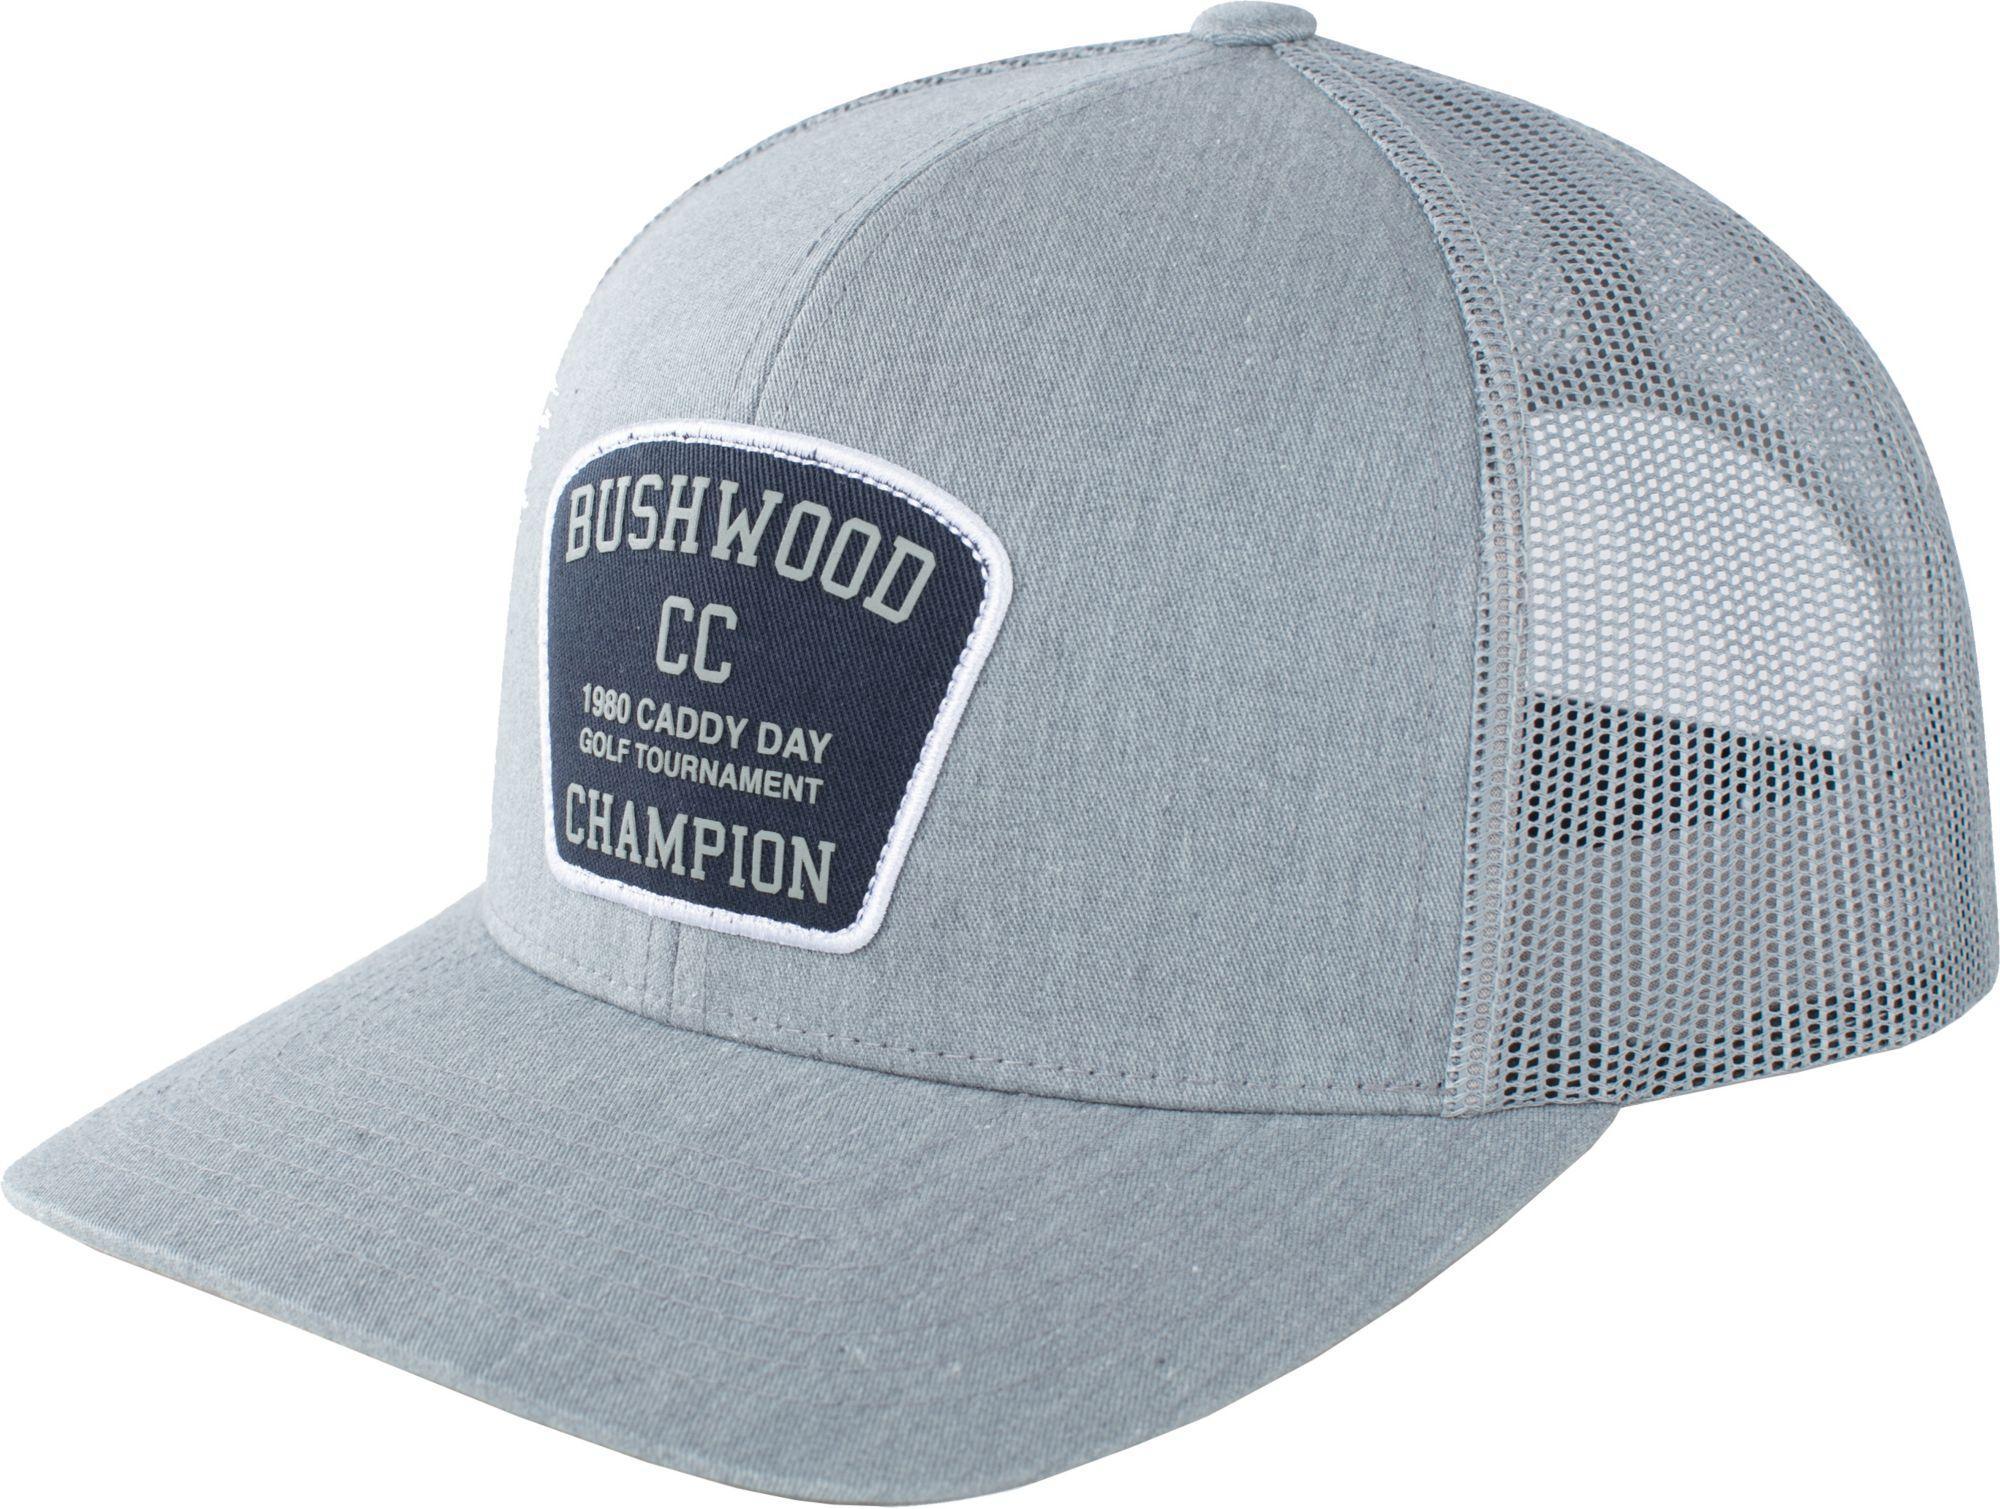 promo code 7032a ba5c2 Travis Mathew Cinderella Story Golf Hat in Blue for Men - Lyst